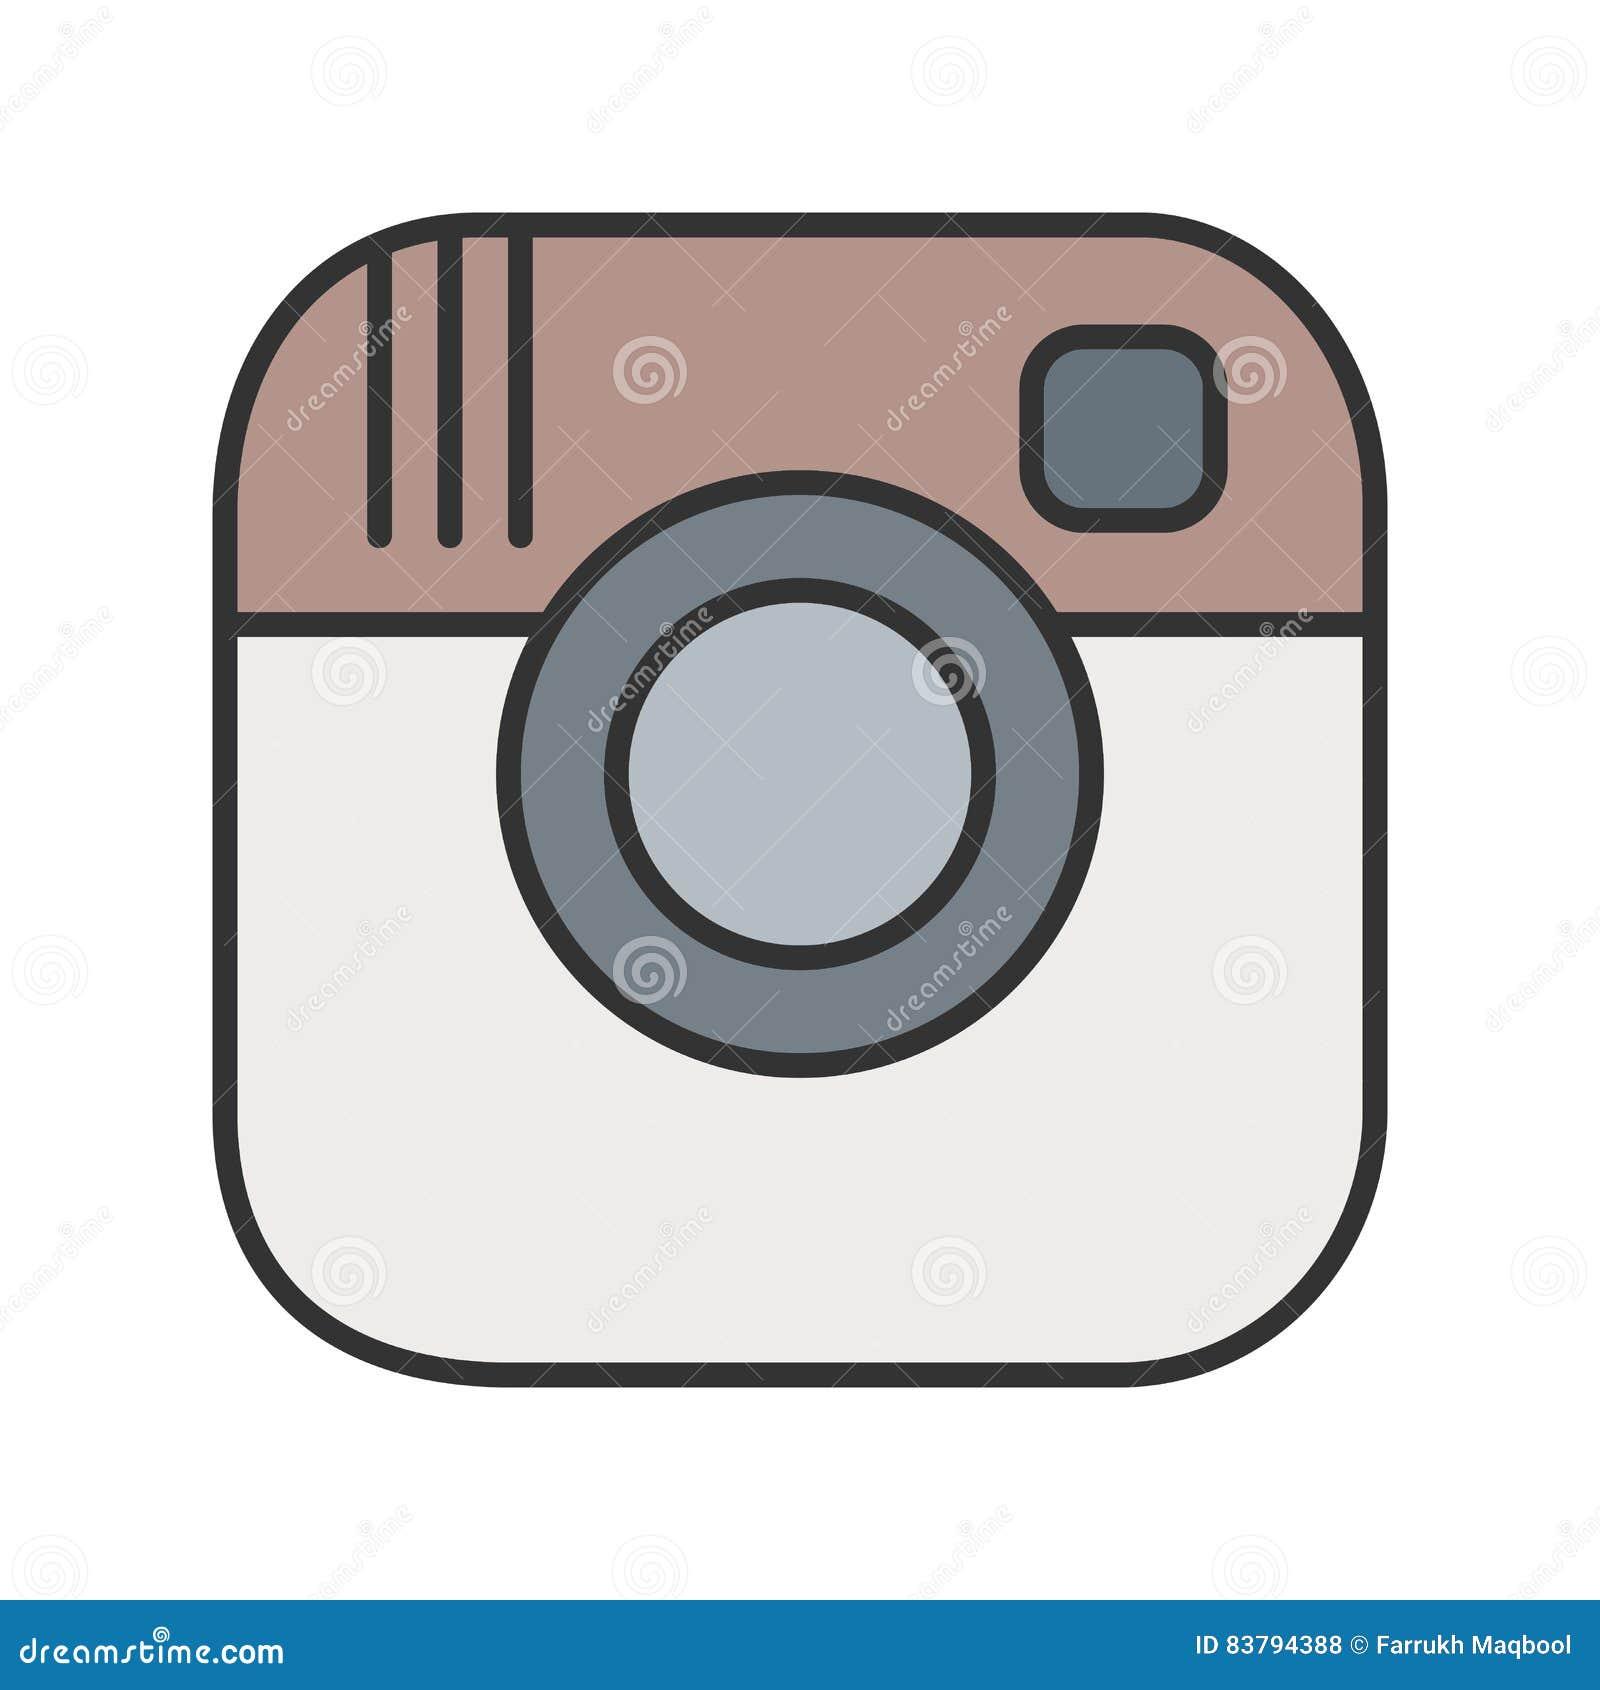 Instagram Editorial Stock Photo Illustration Of Technology 83794388